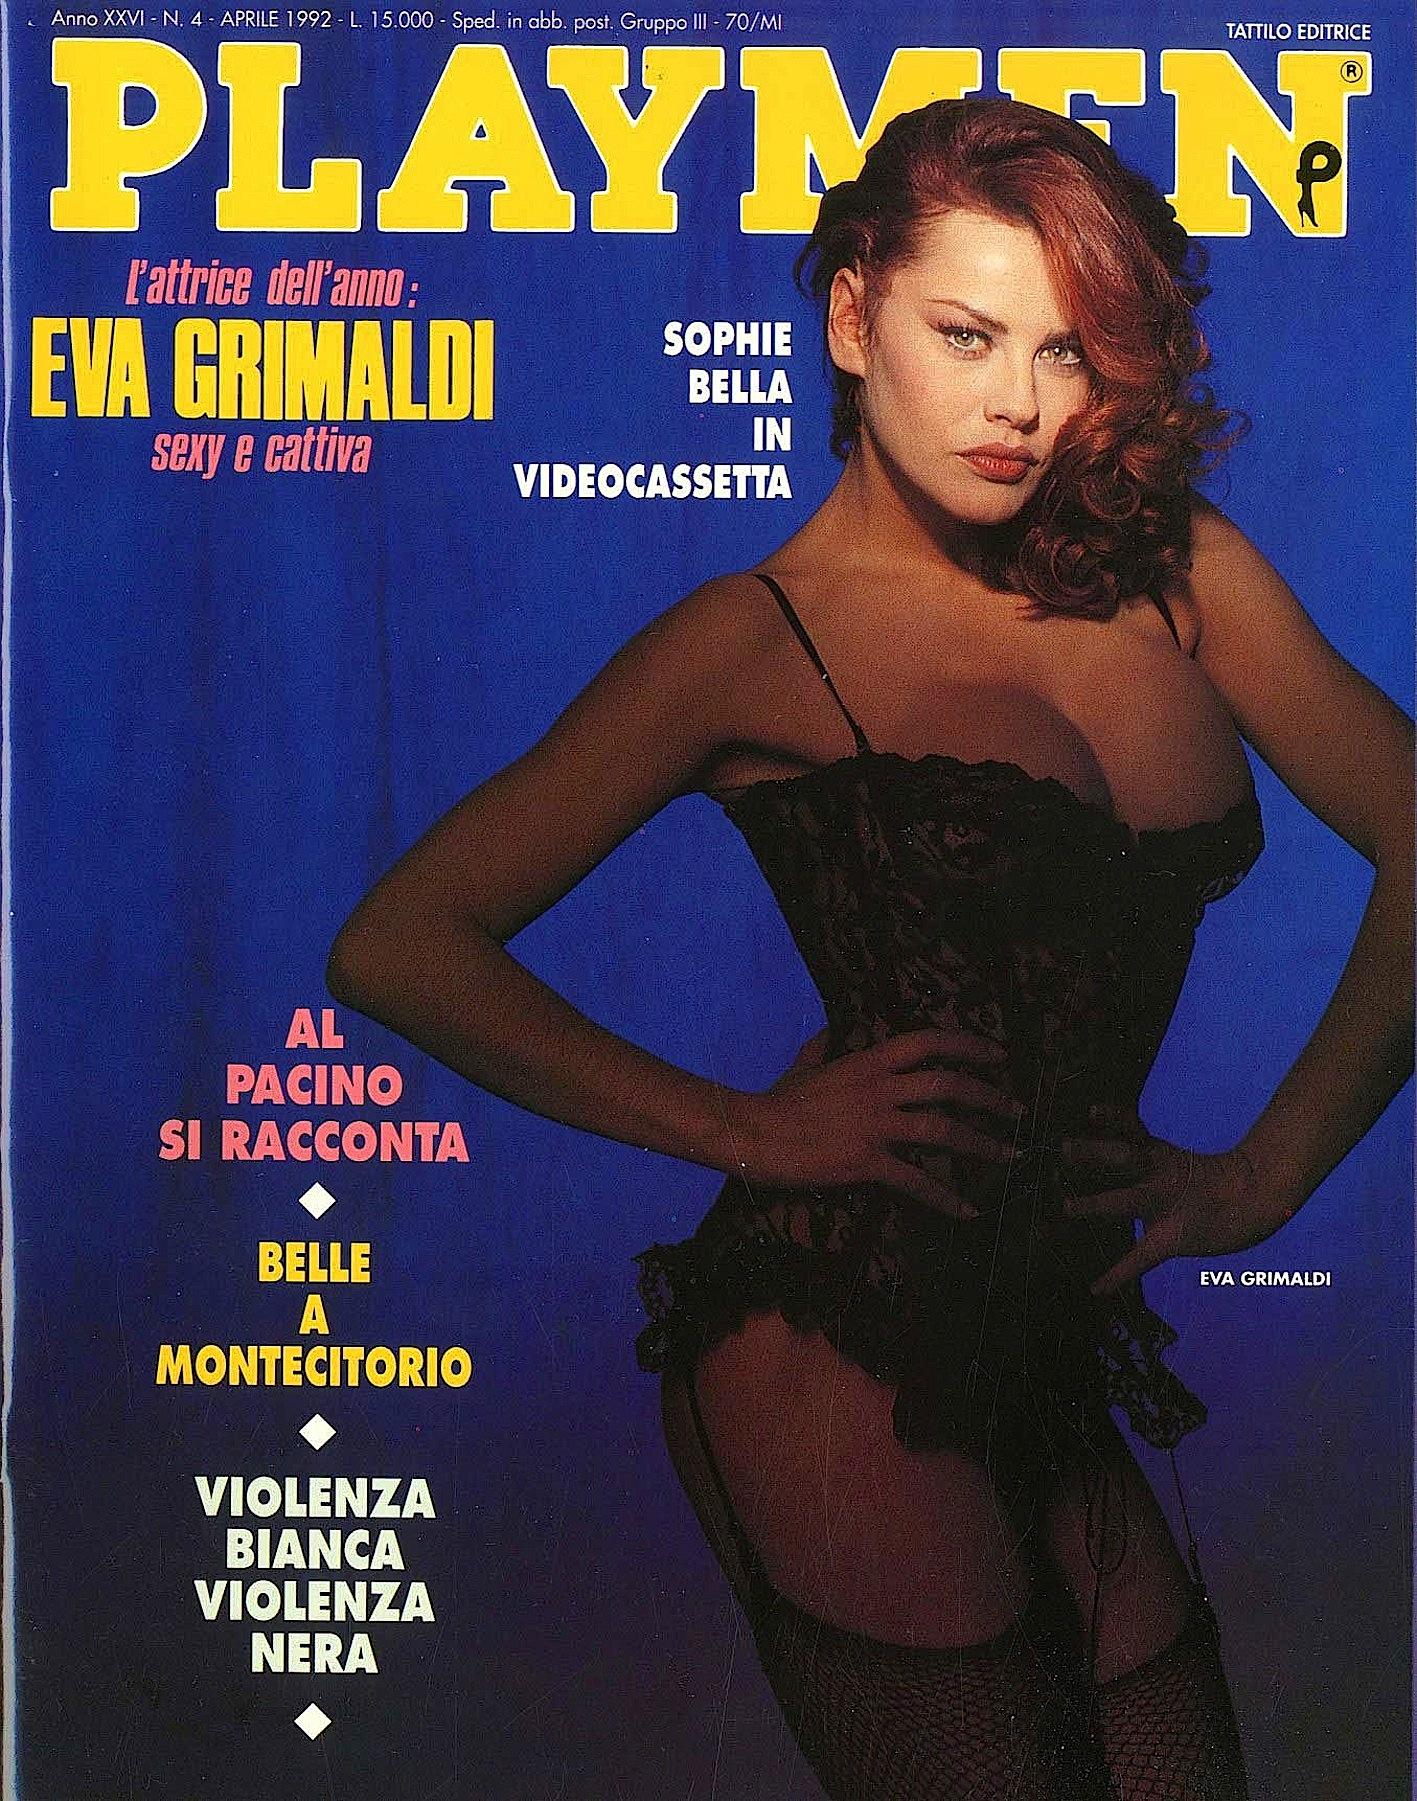 eva_grimaldi_PLAYMEN-1992